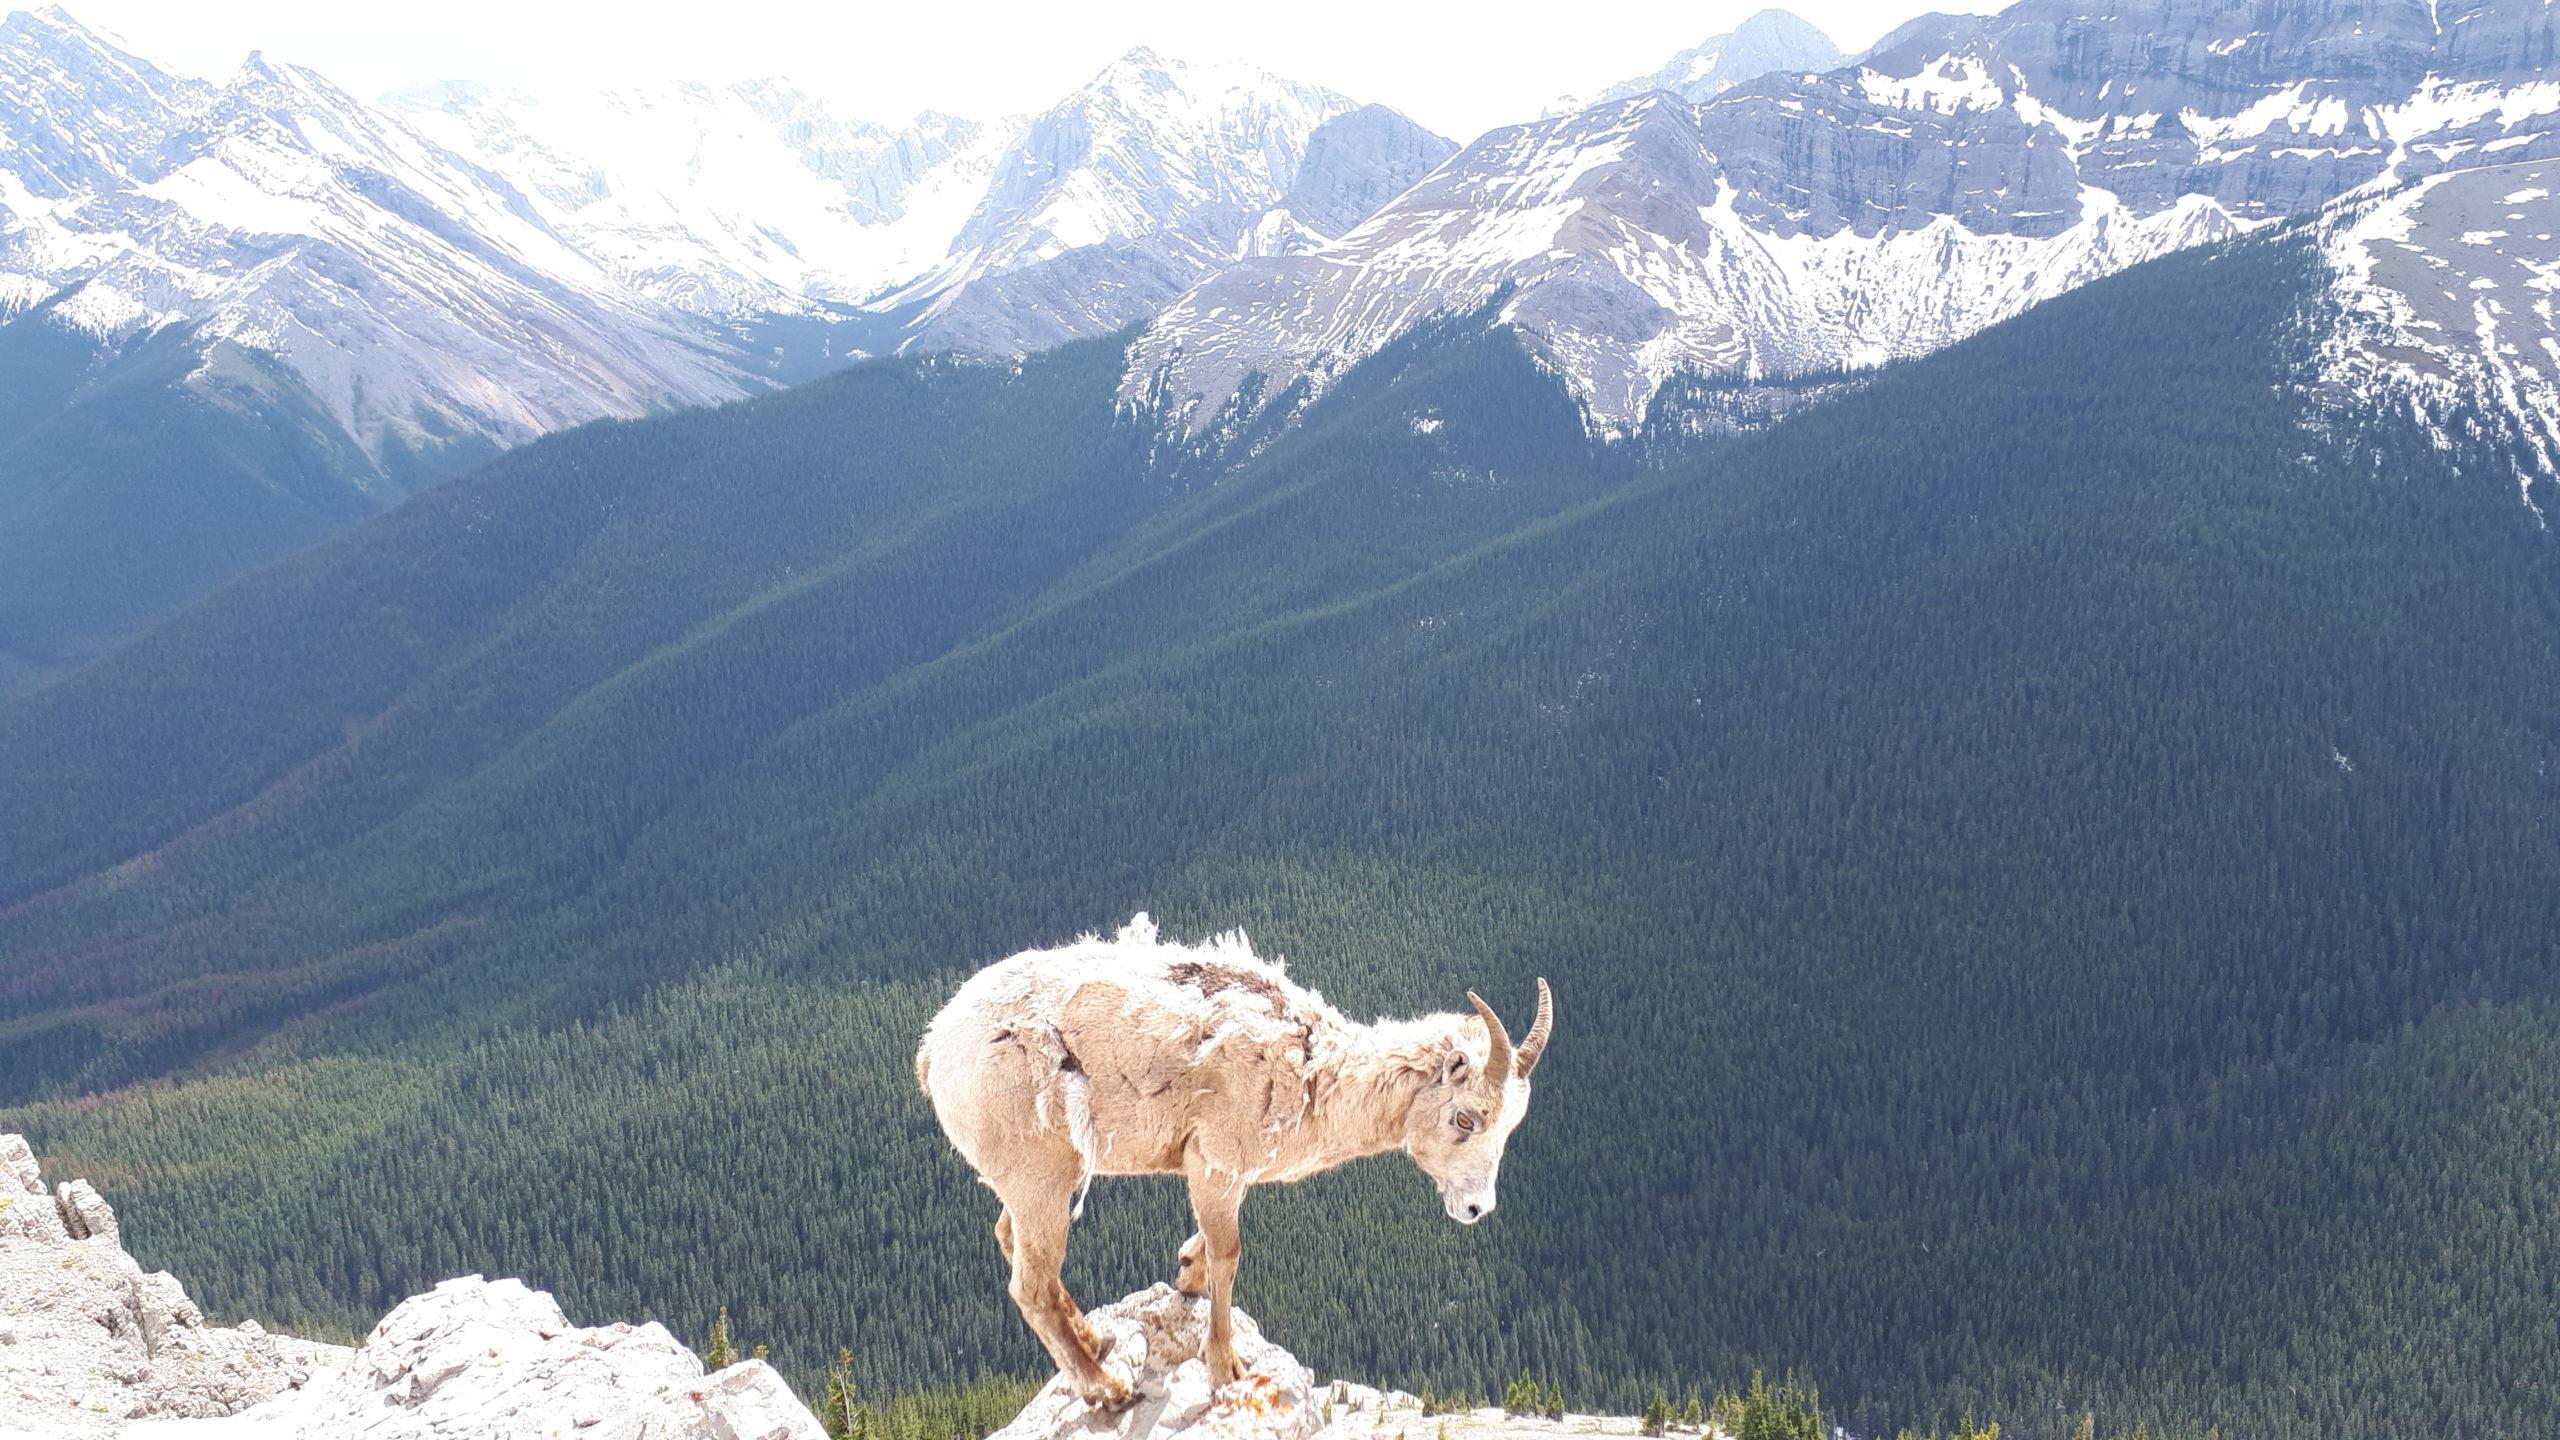 Canada's Panoramic Captures